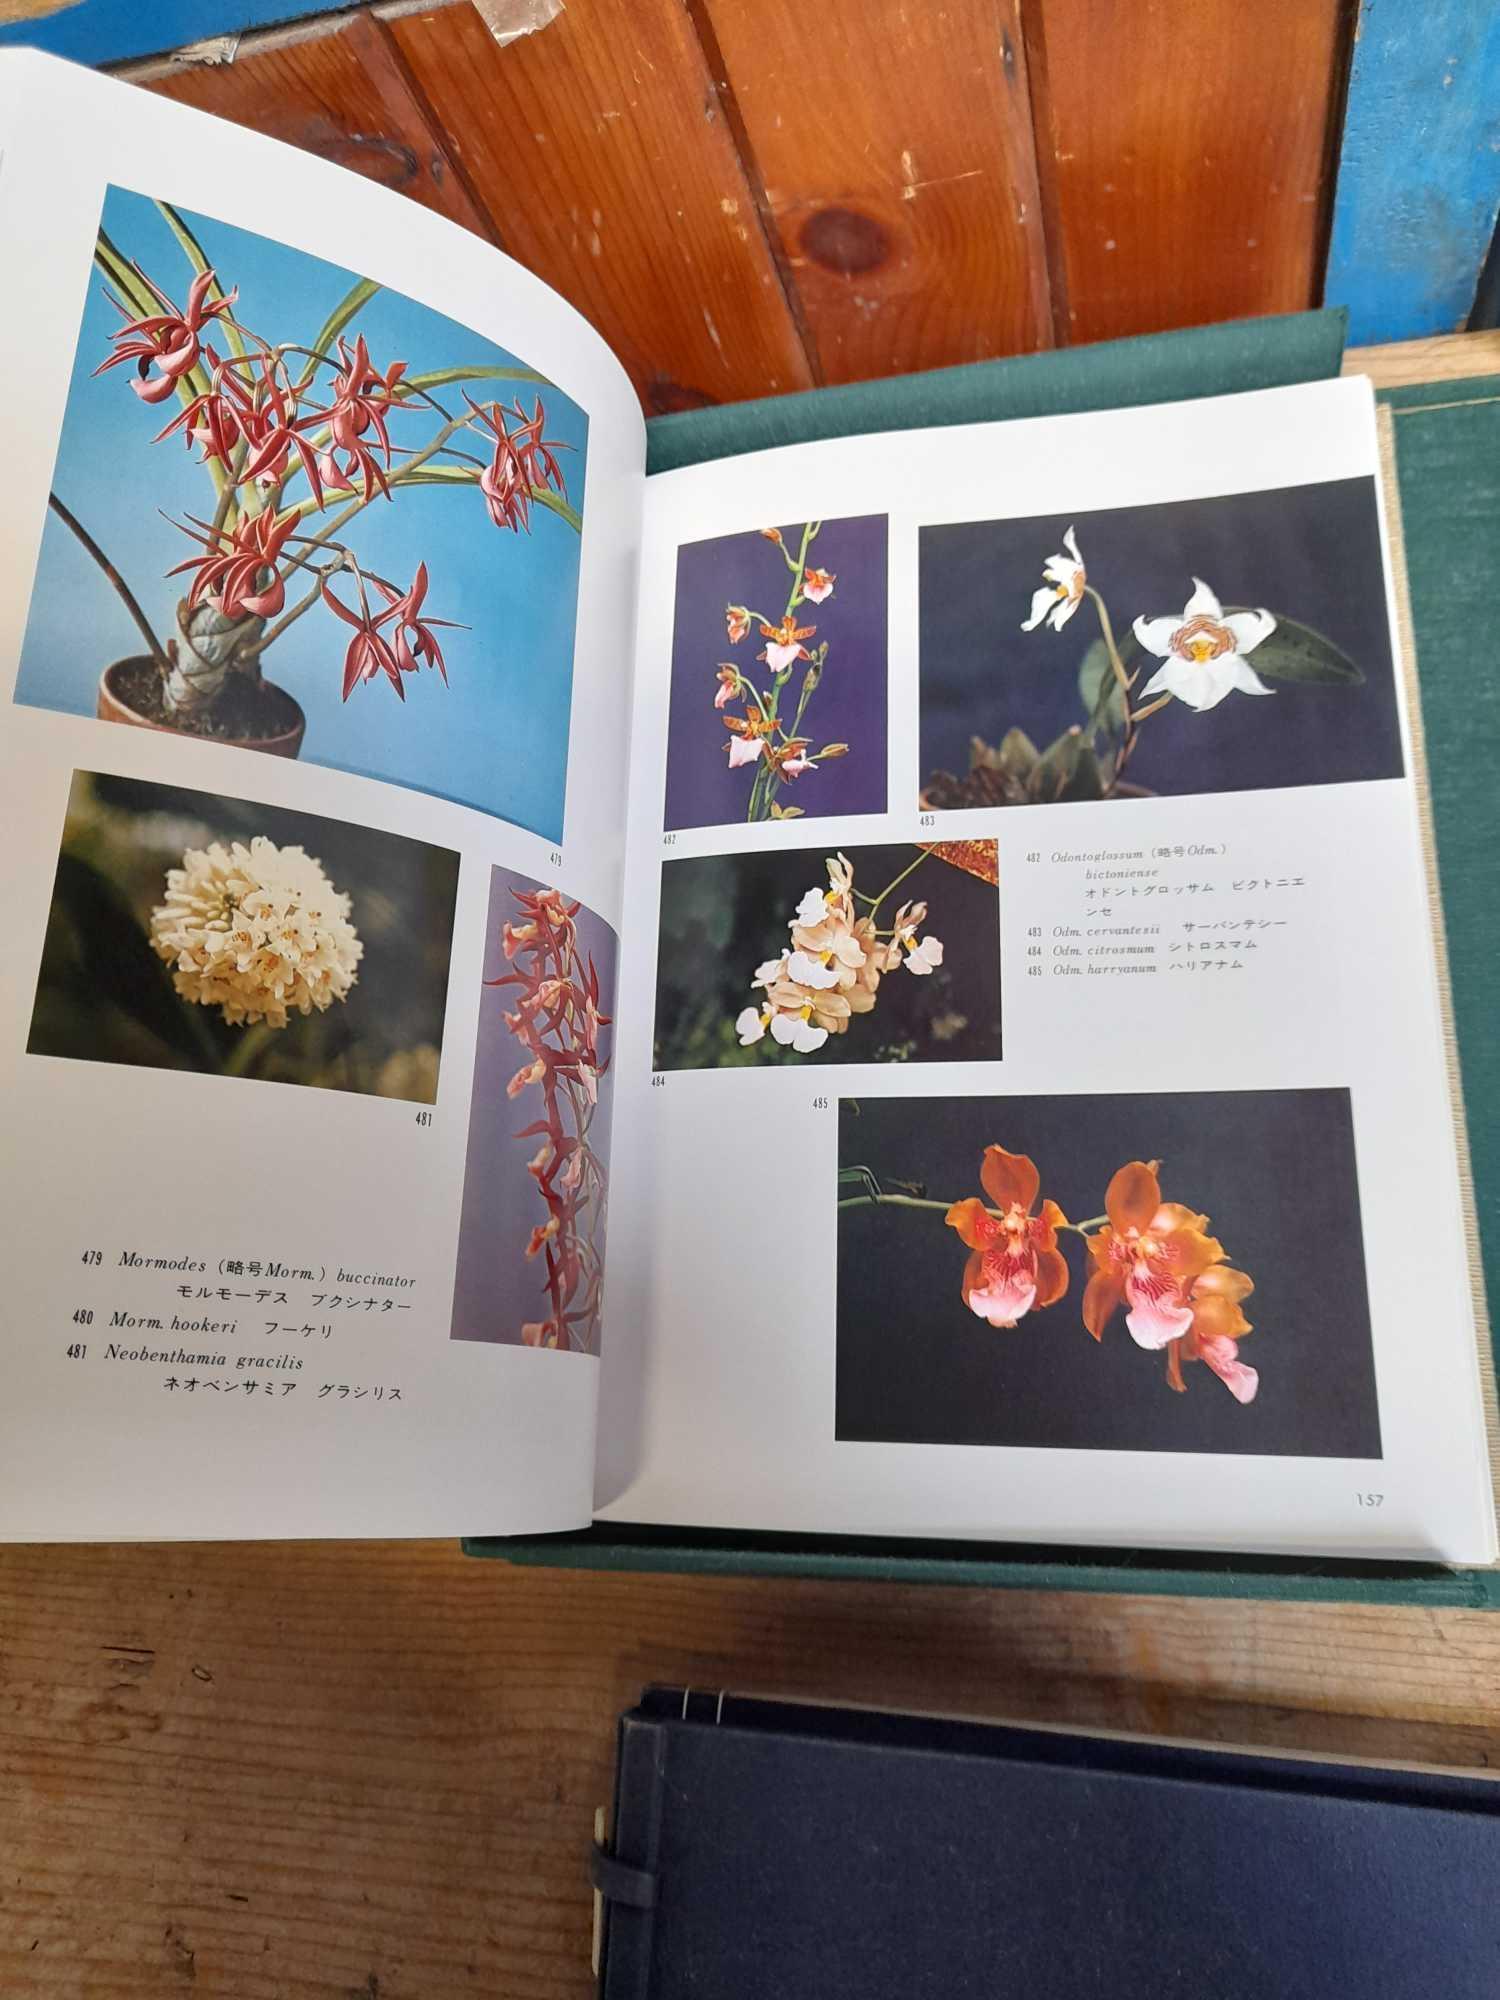 2 ORIENTAL BOOKS - Image 7 of 14